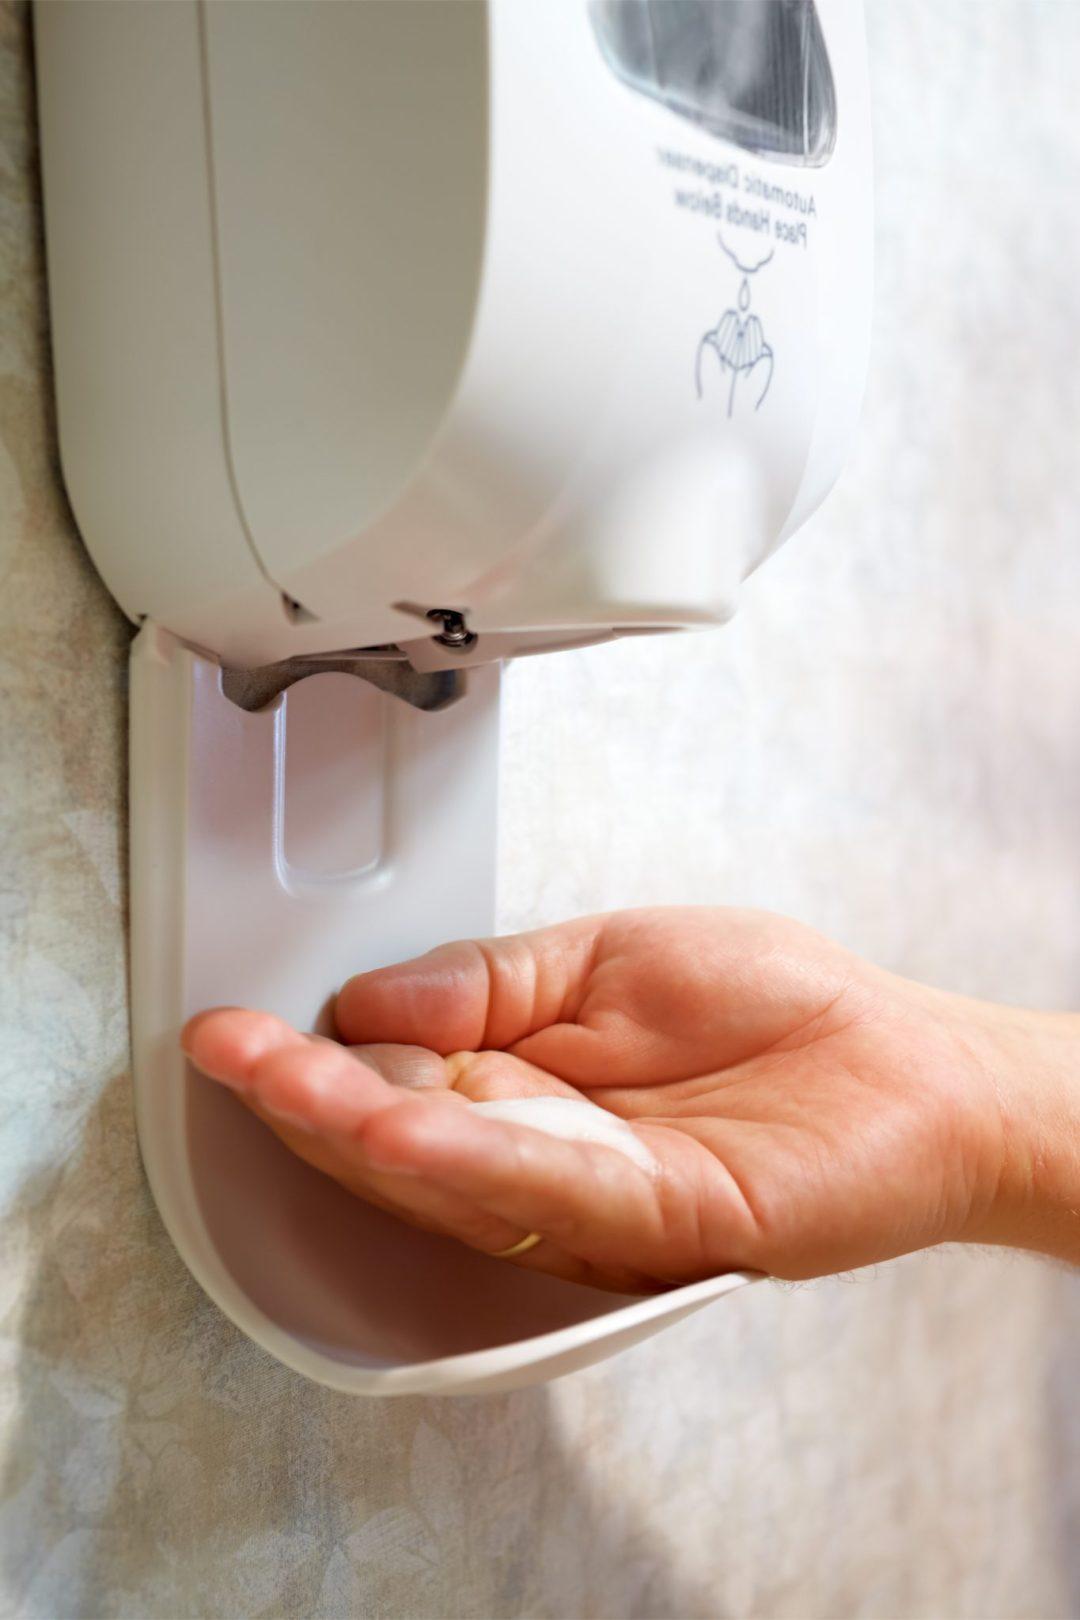 Hand sanitizer resistant